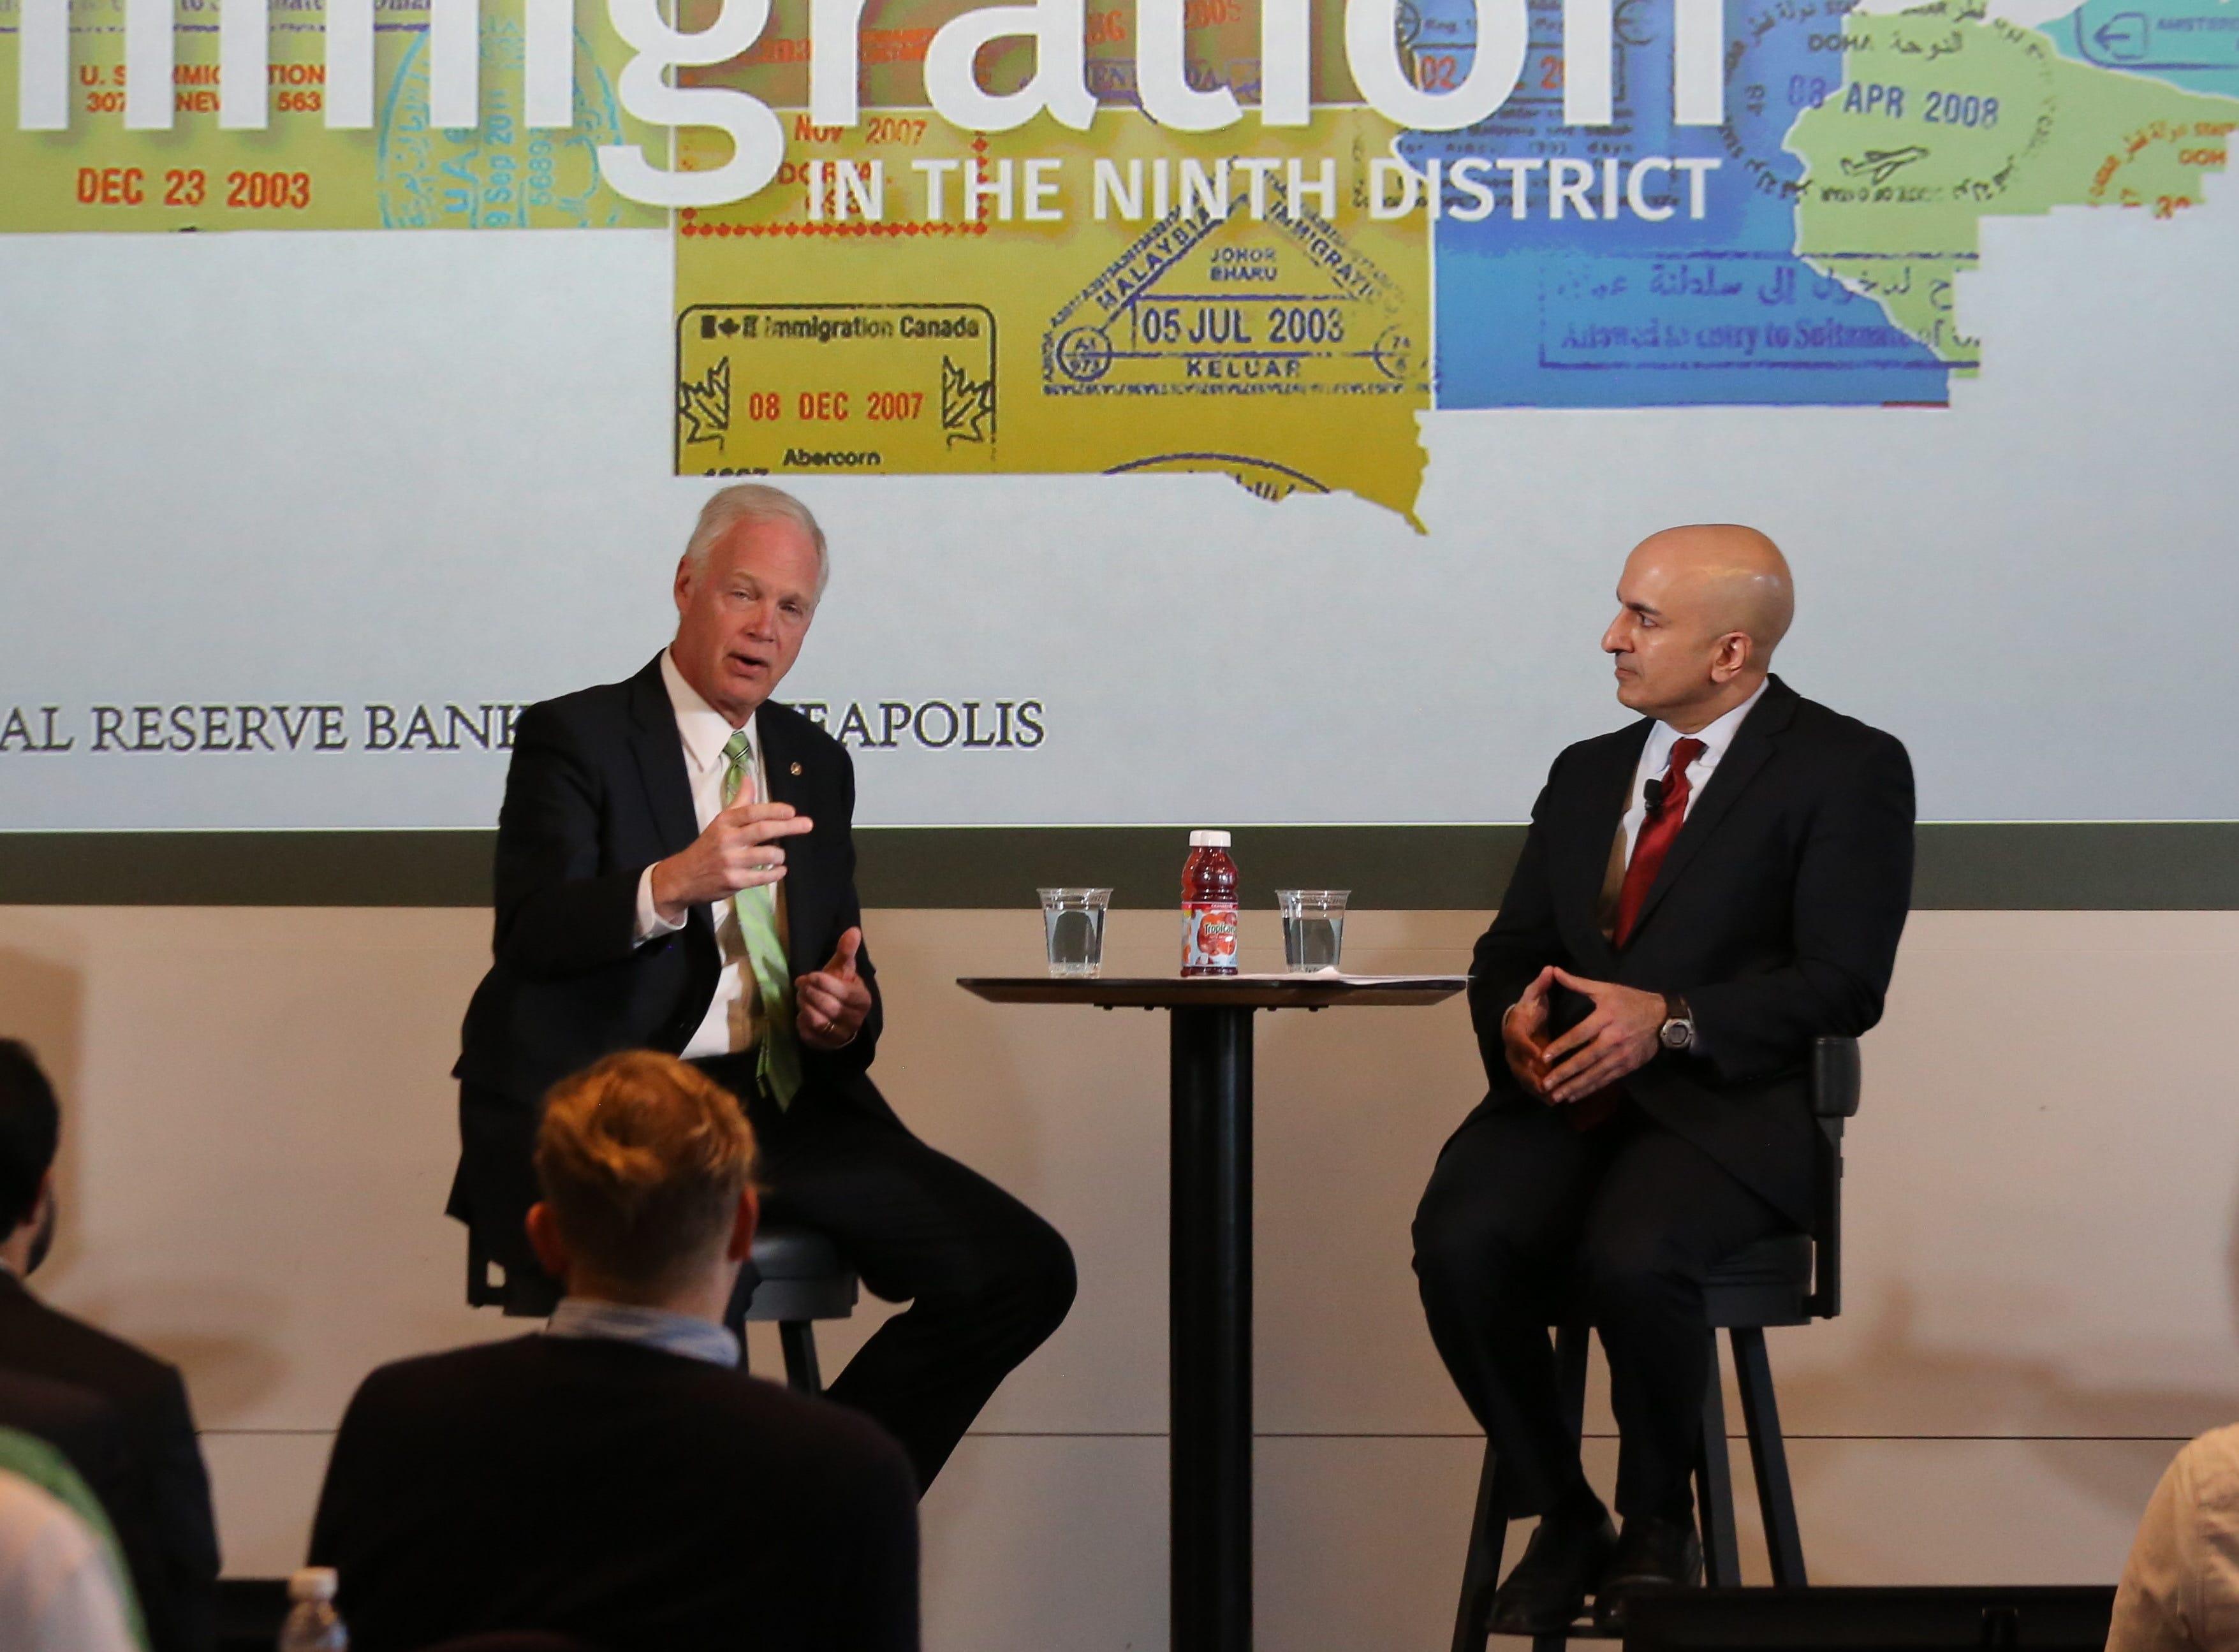 Immigrants play key role in Minnesota's future workforce